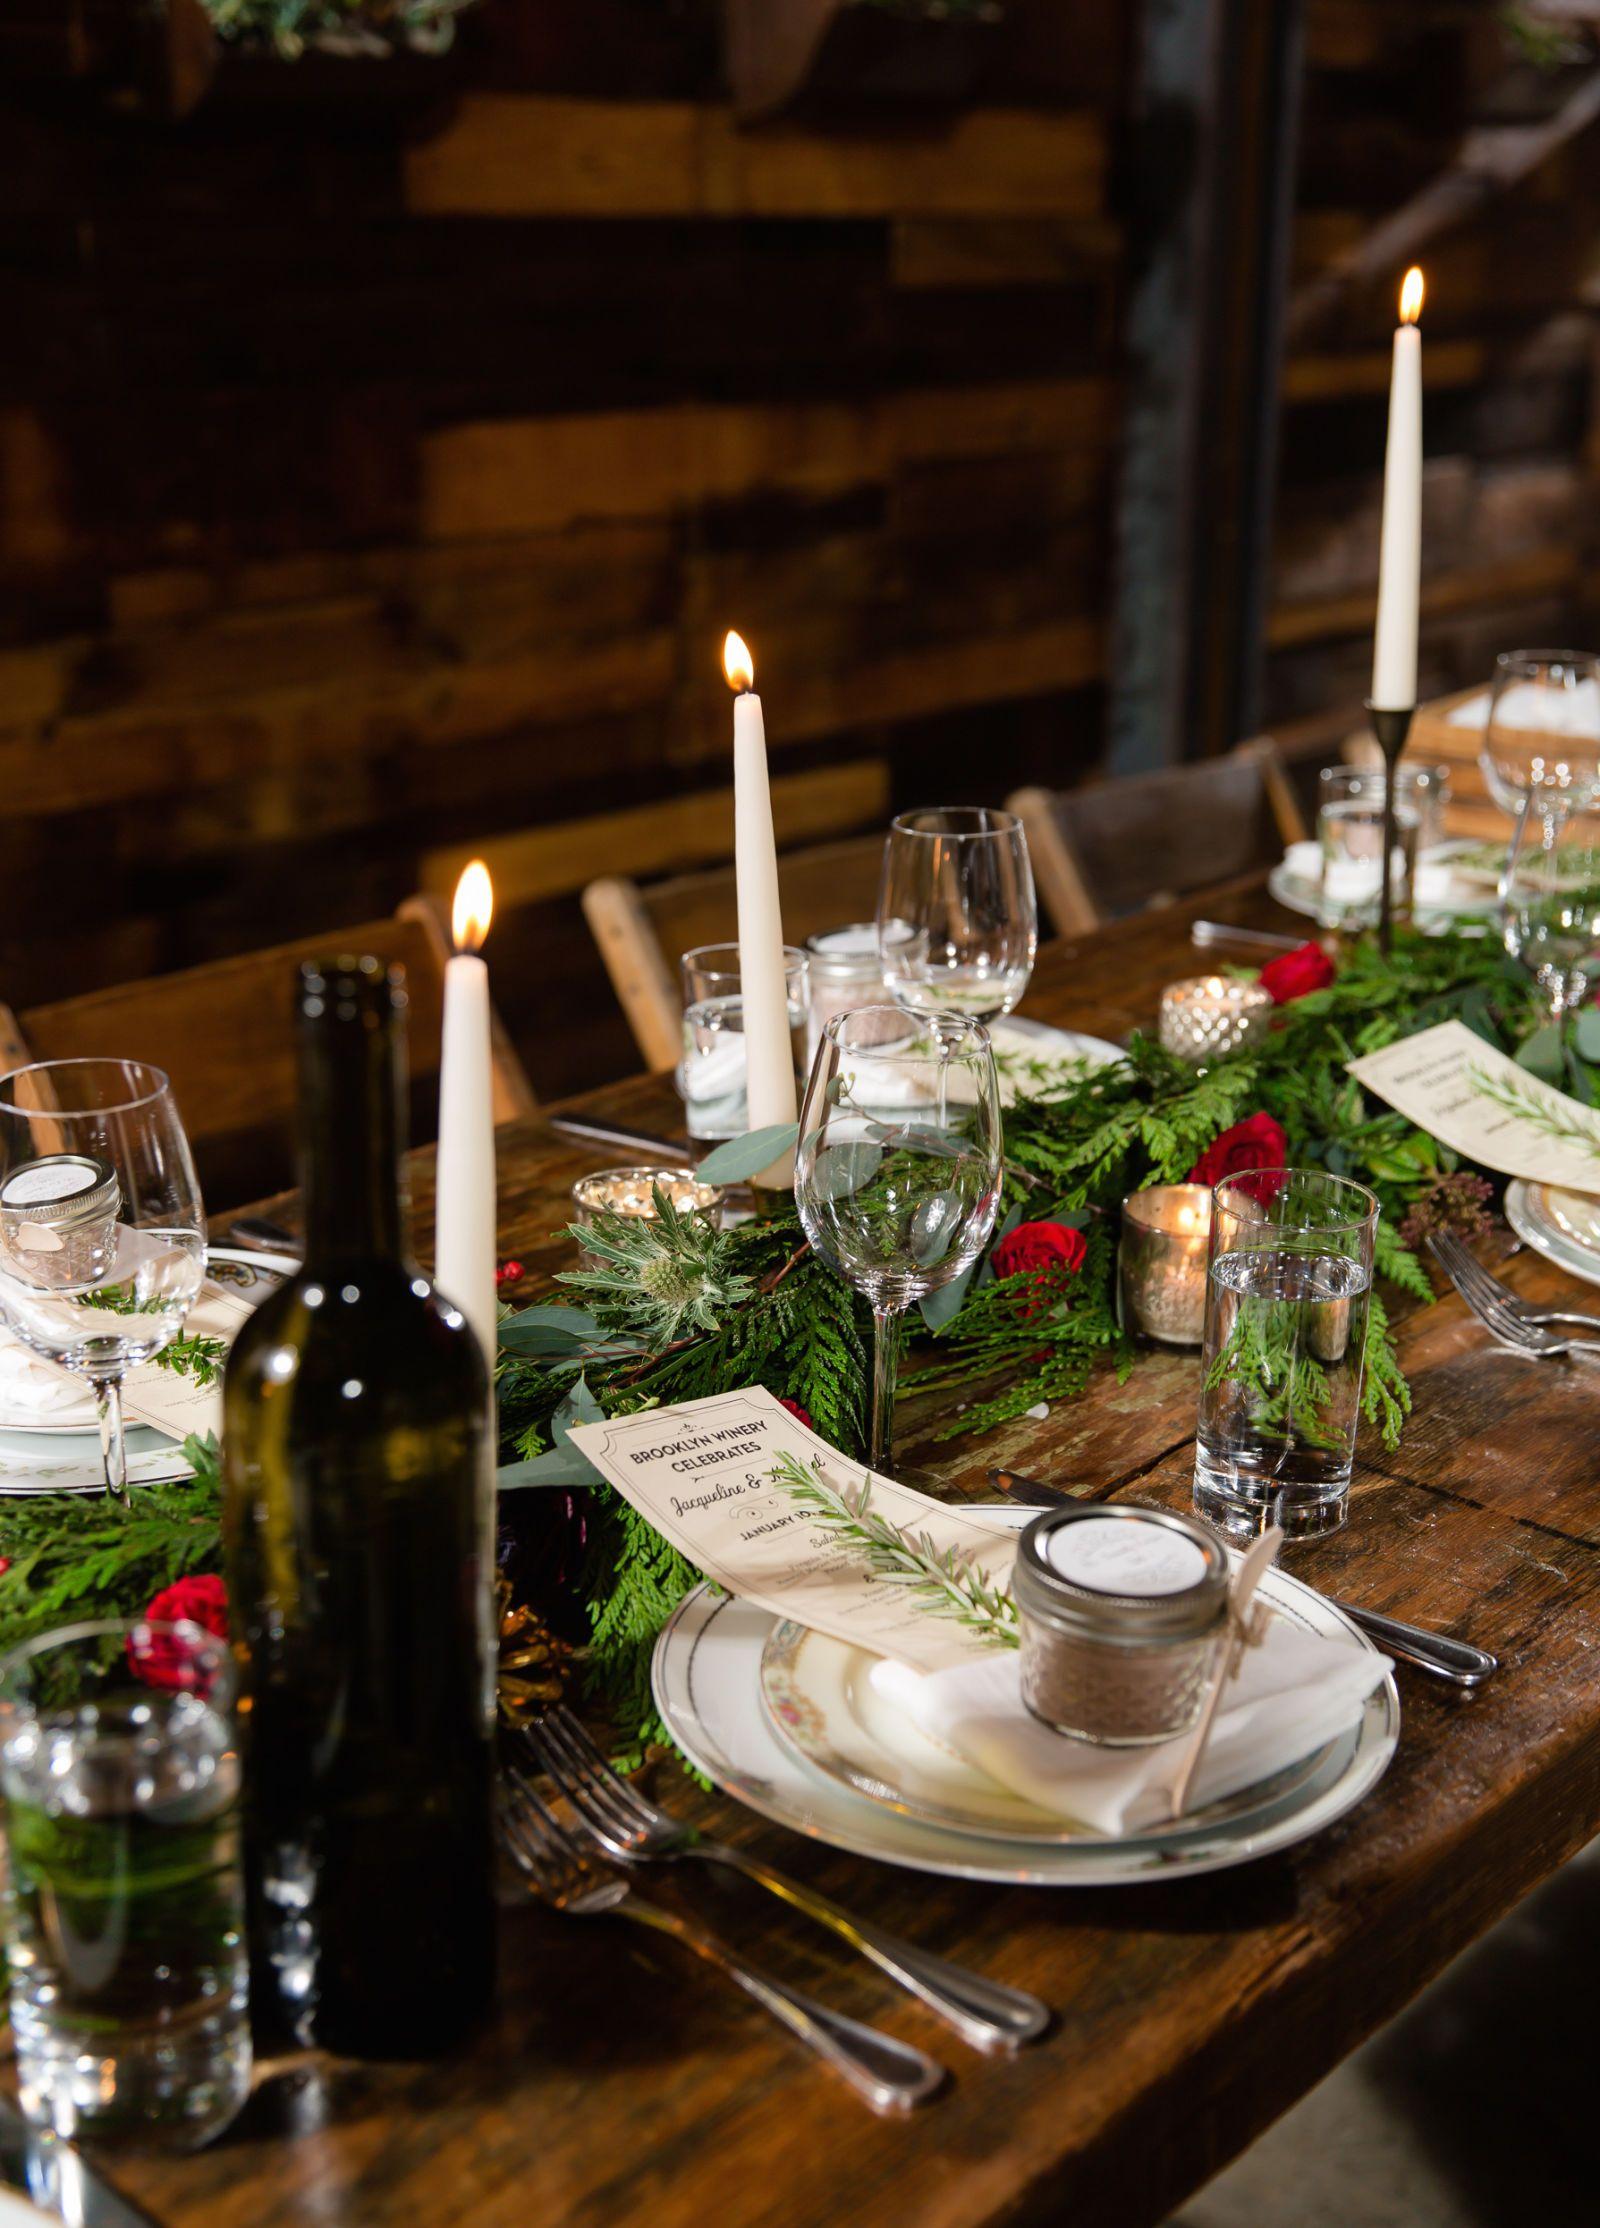 20 best christmas table centerpieces easy ideas for holiday rh elledecor com homemade christmas table decorations centerpieces christmas table decorations centerpieces australia